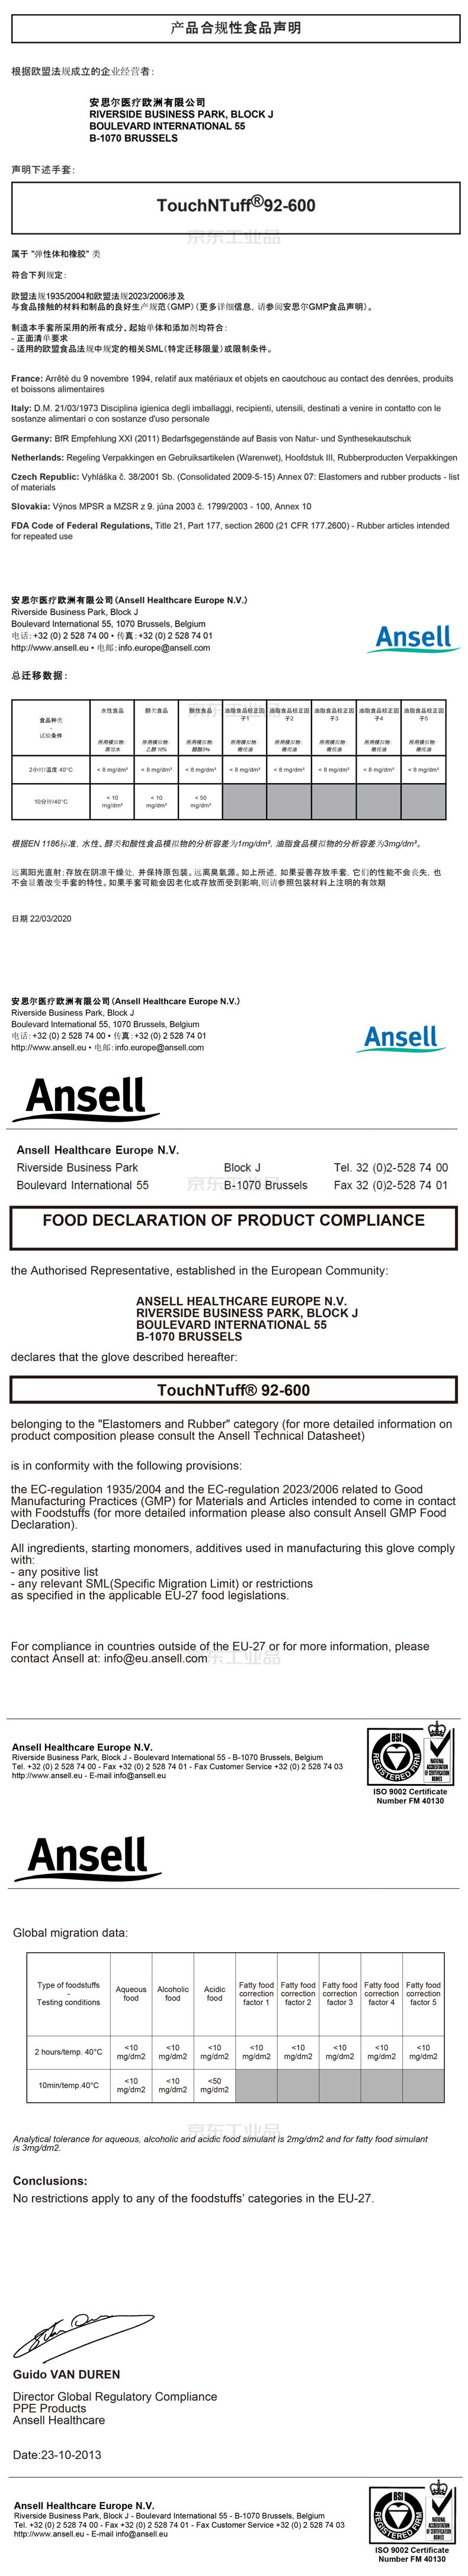 Ansell安思尔 绿色丁腈橡胶手套(M),无粉尘,工业级,0.12mm厚,24cm长 (FDA,IOS)